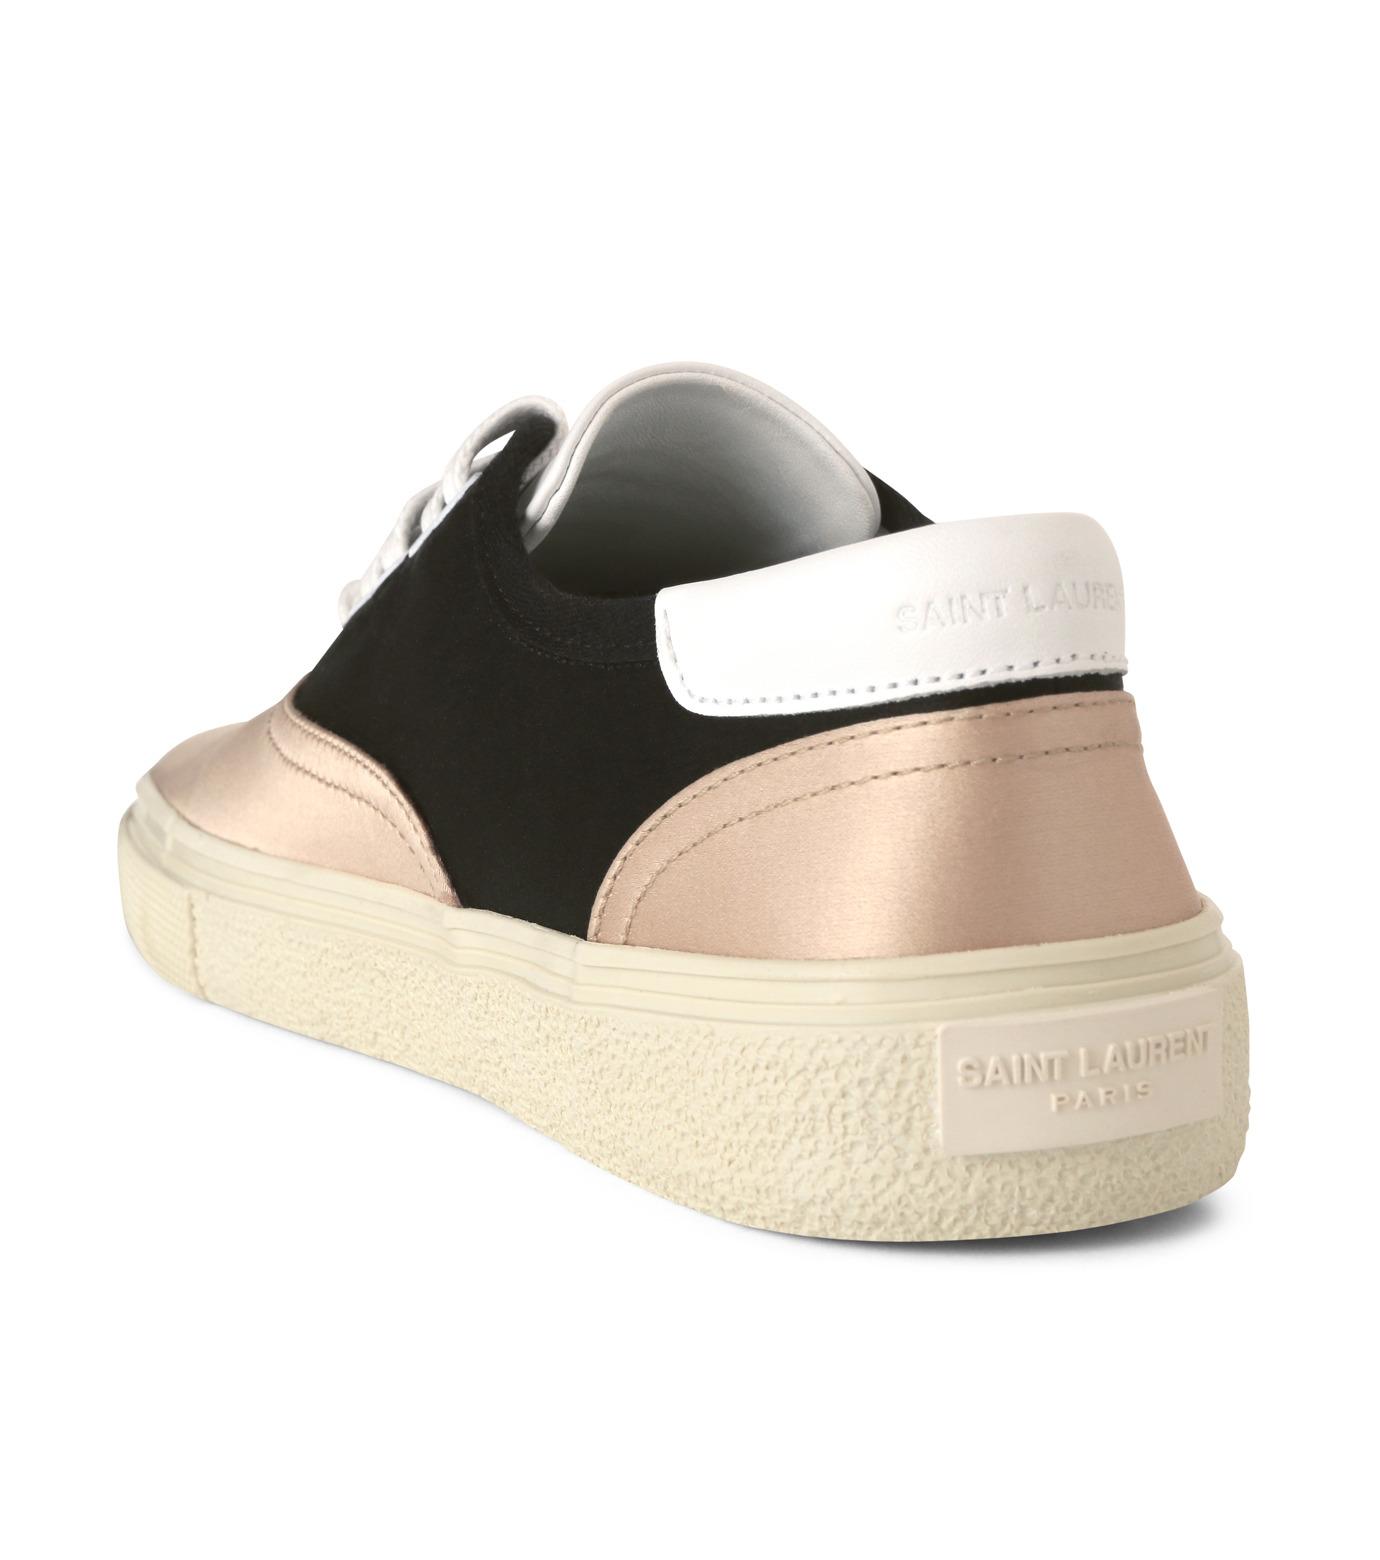 SAINT LAURENT(サンローラン)のSkate Sneaker Lace Up Satin-BEIGE(スニーカー/sneaker)-345062-F1430-52 拡大詳細画像2